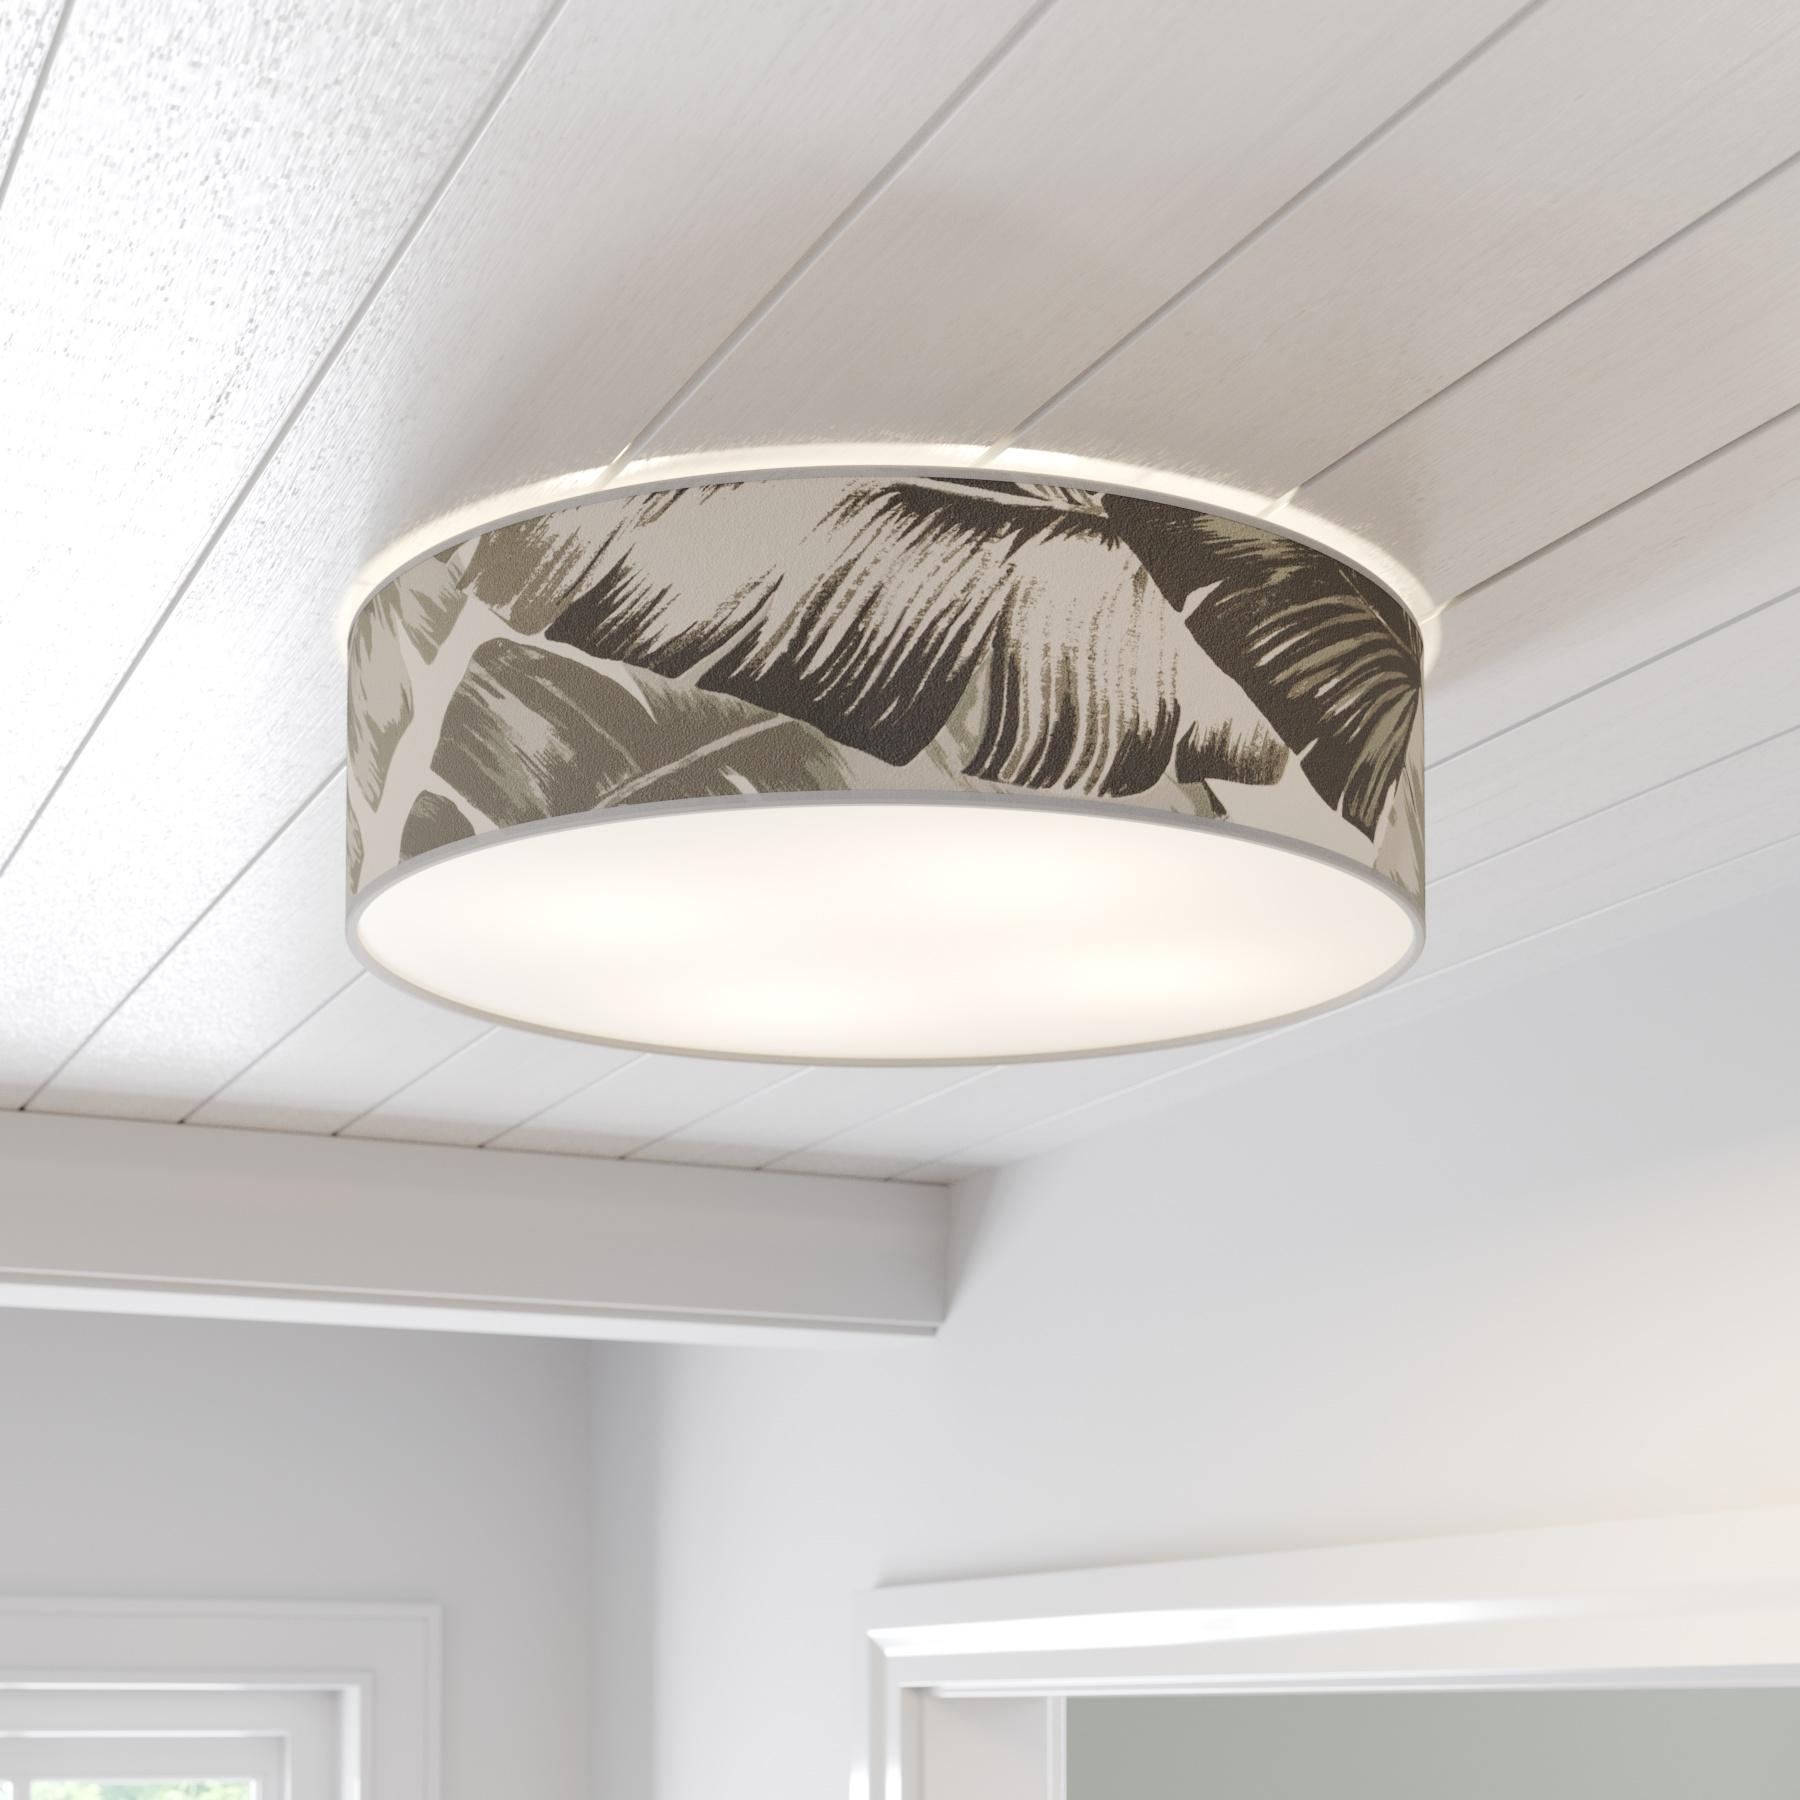 Plafondlamp Madera met opening rond Ø 58 cm